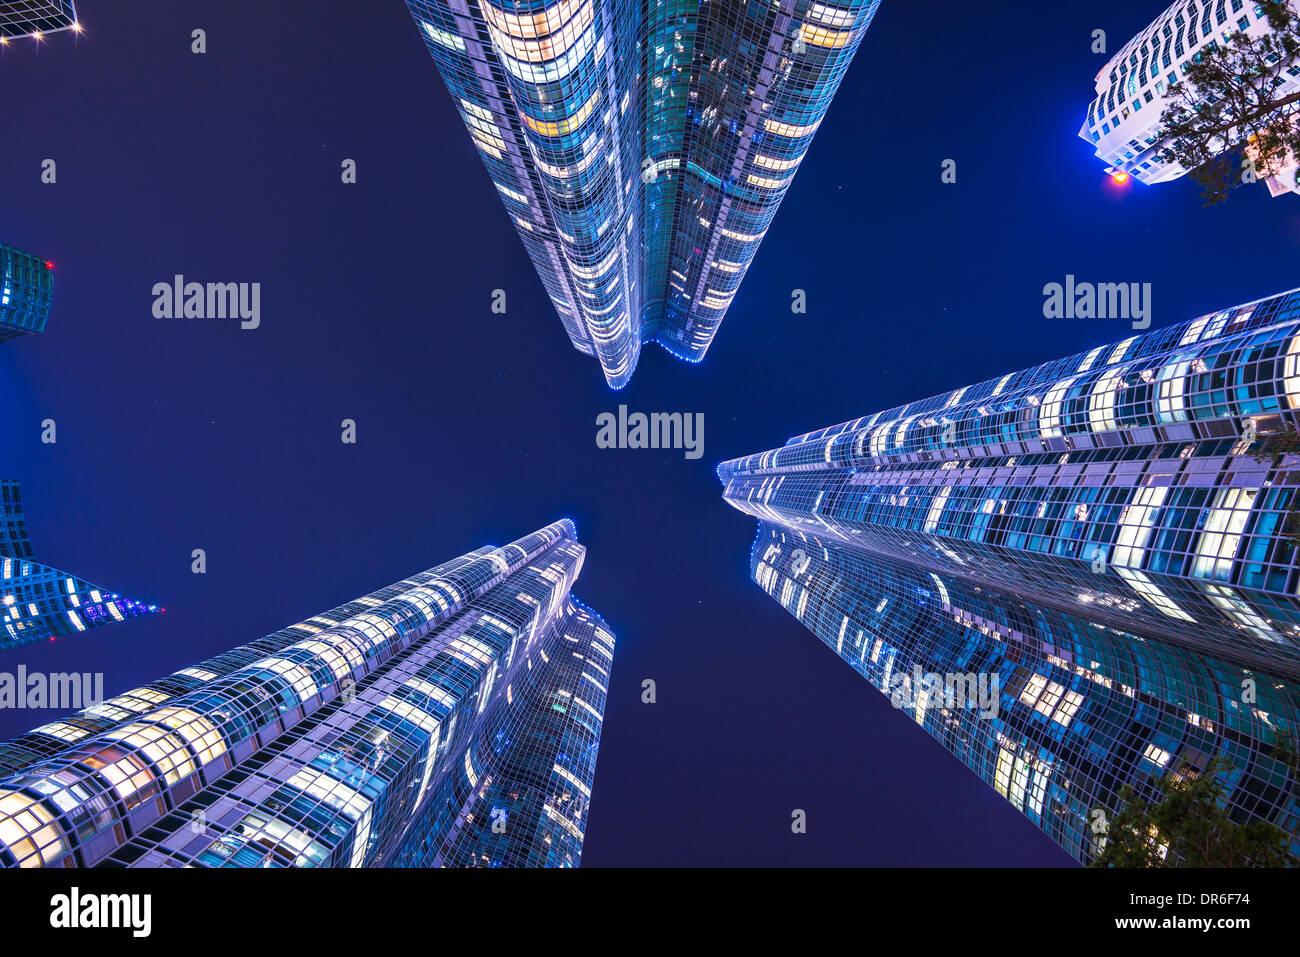 Busan, South Korea skyline at Haeundae District. - Stock Image